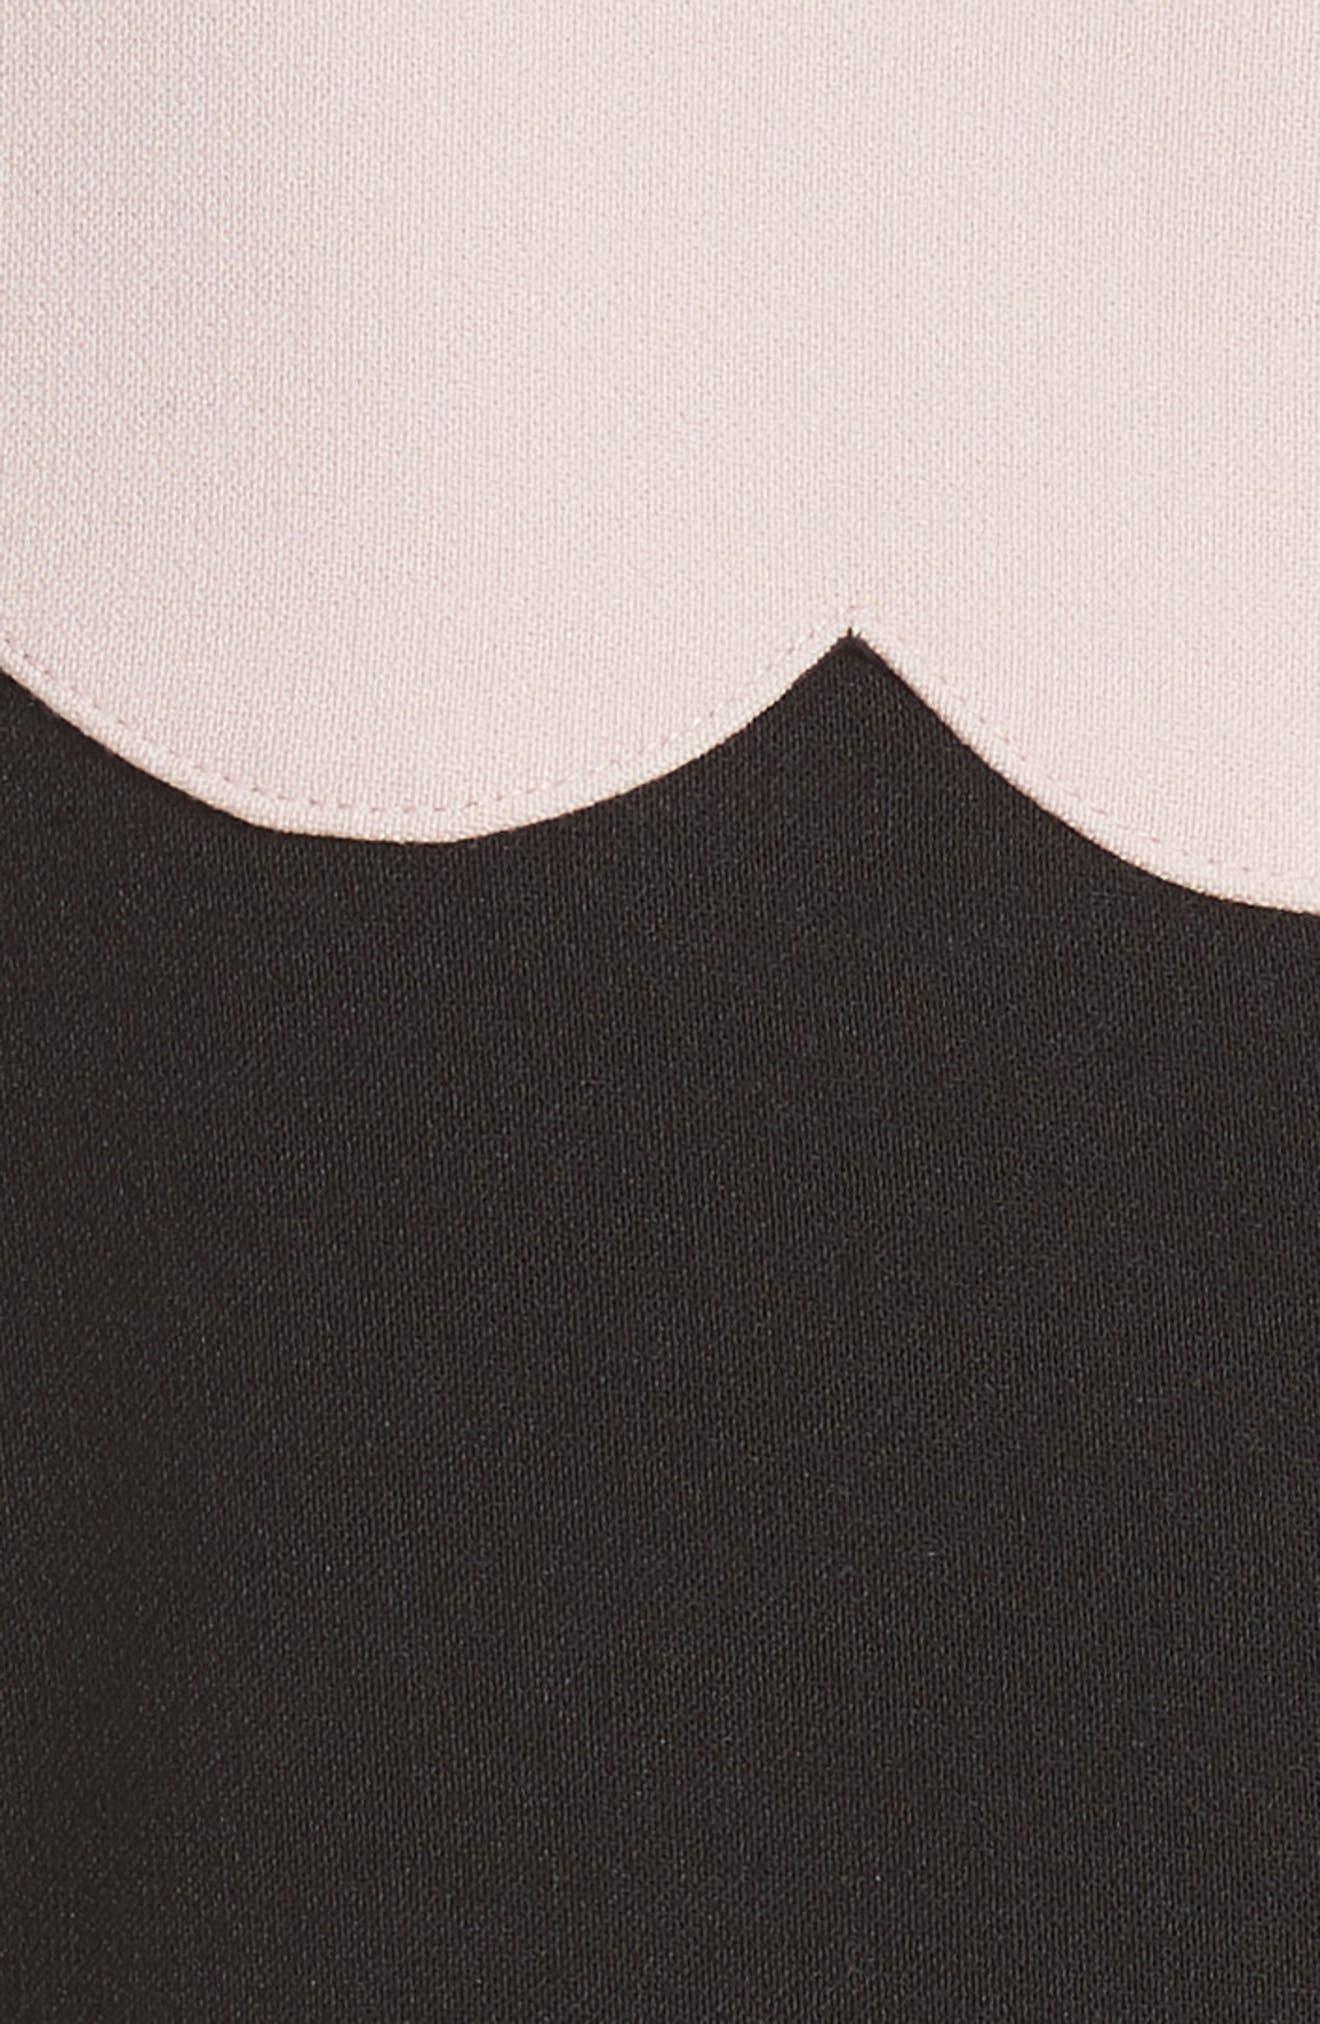 scallop sleeveless dress,                             Alternate thumbnail 5, color,                             663